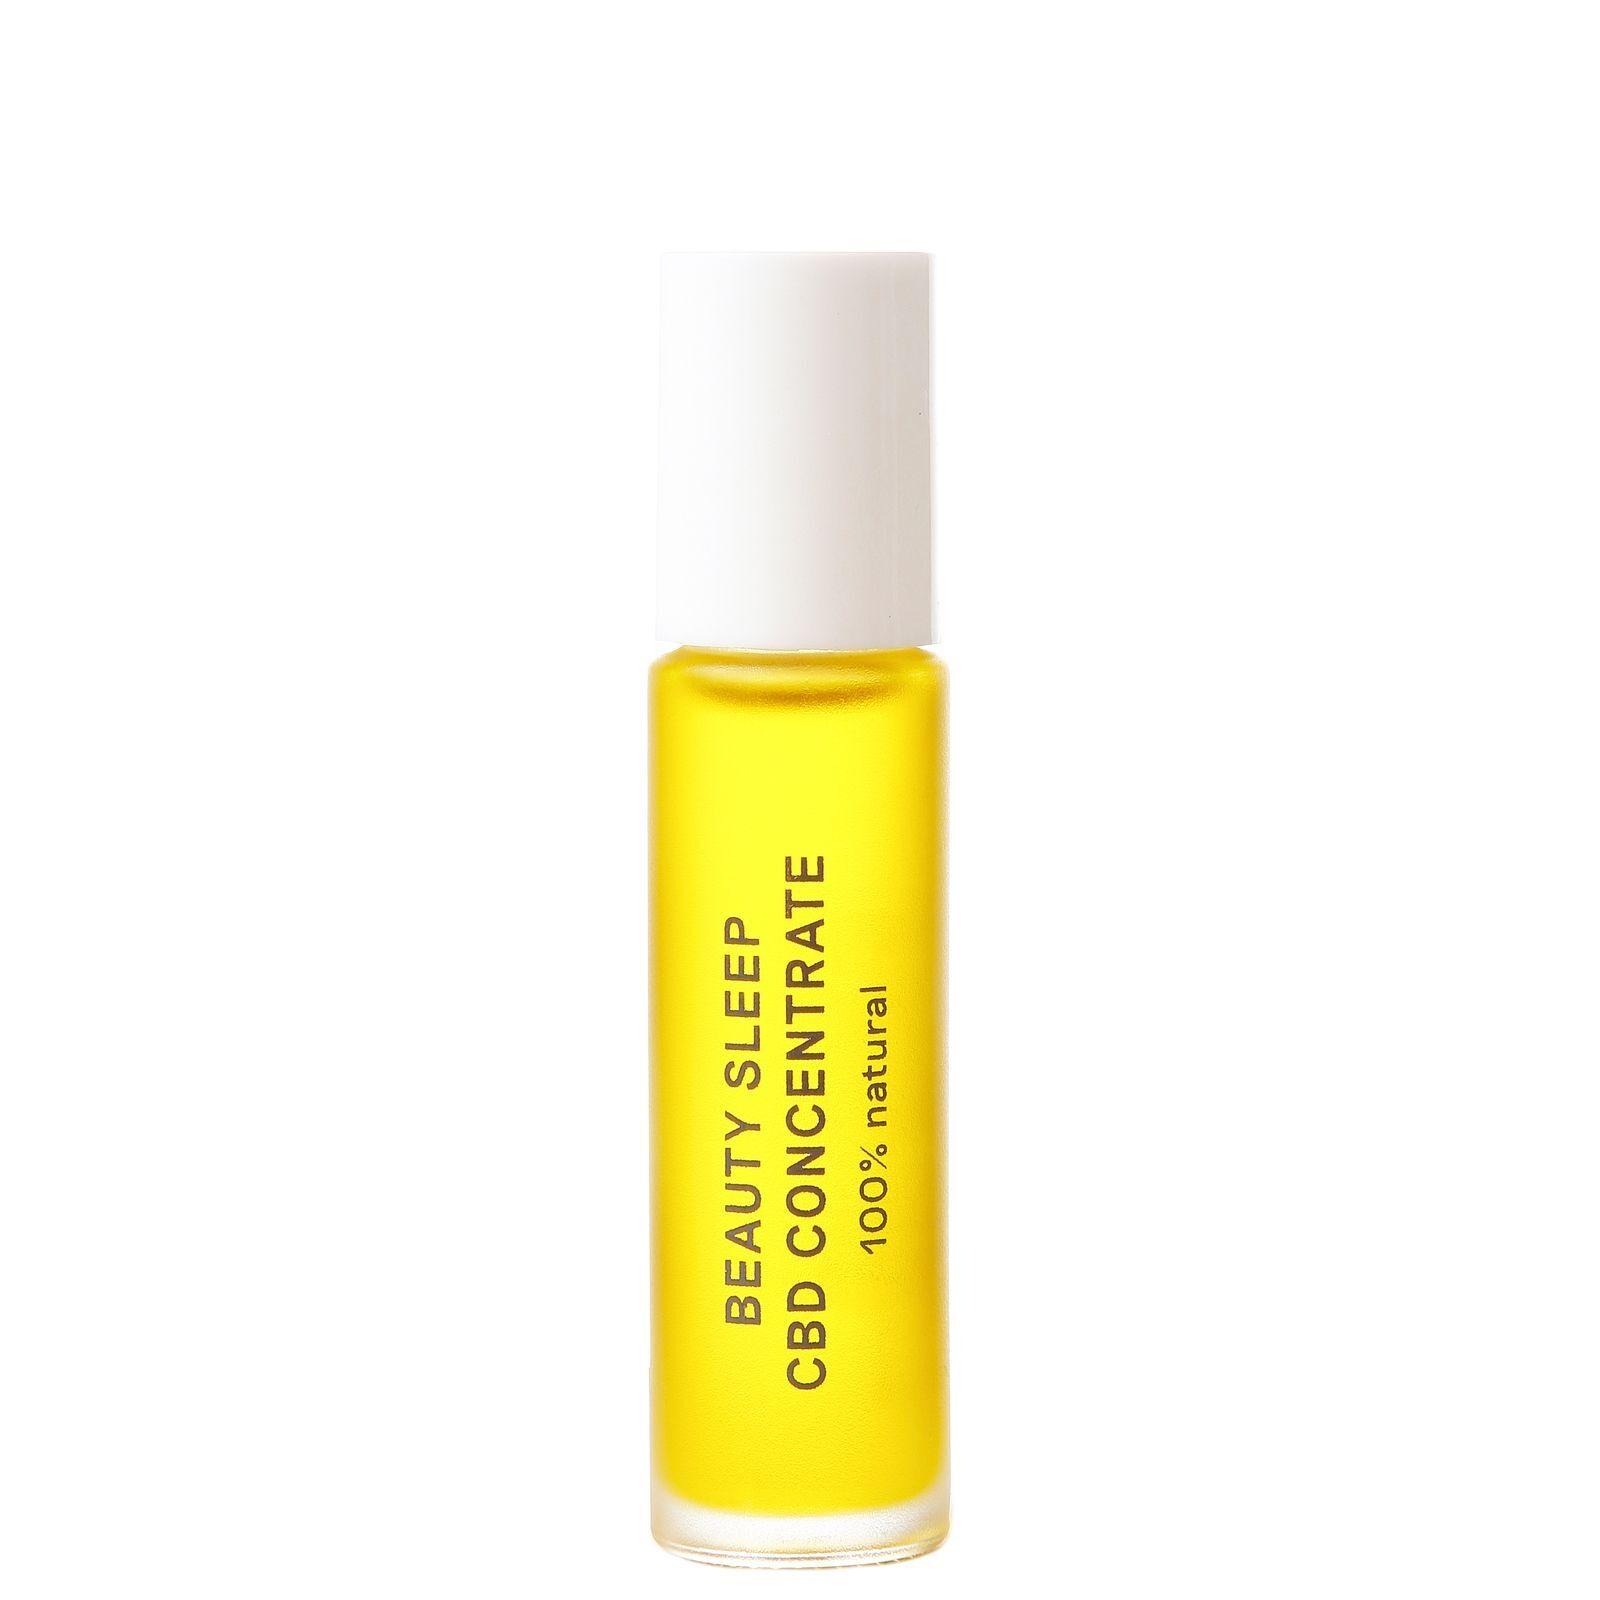 Balance Me - Oils & Serums Beauty Sleep CBD Concentrate 10ml for Women